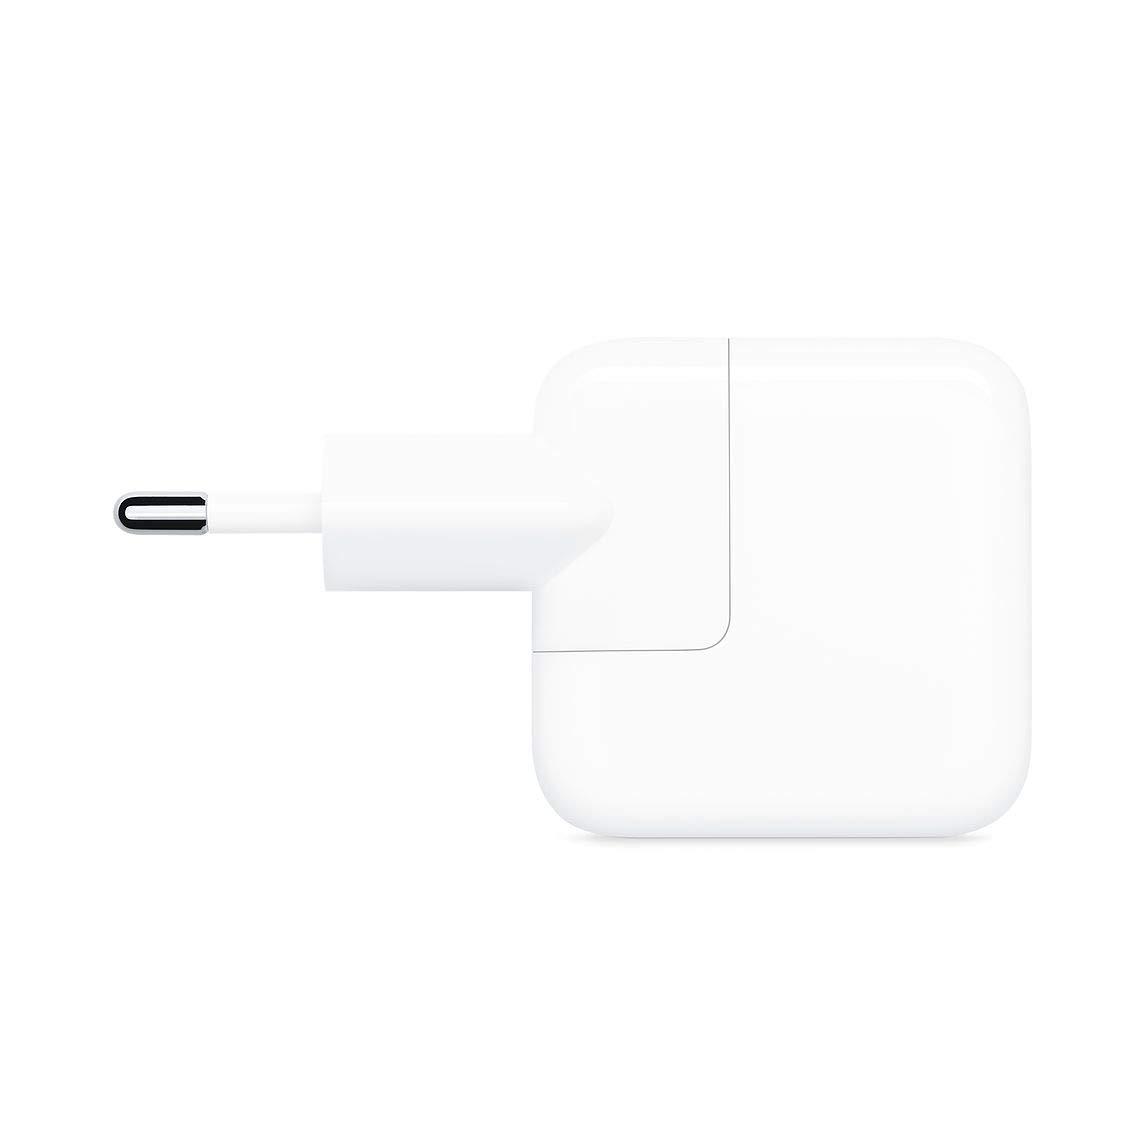 Apple 12W USB Power Adapter (for iPhone, iPad, Apple Watch)